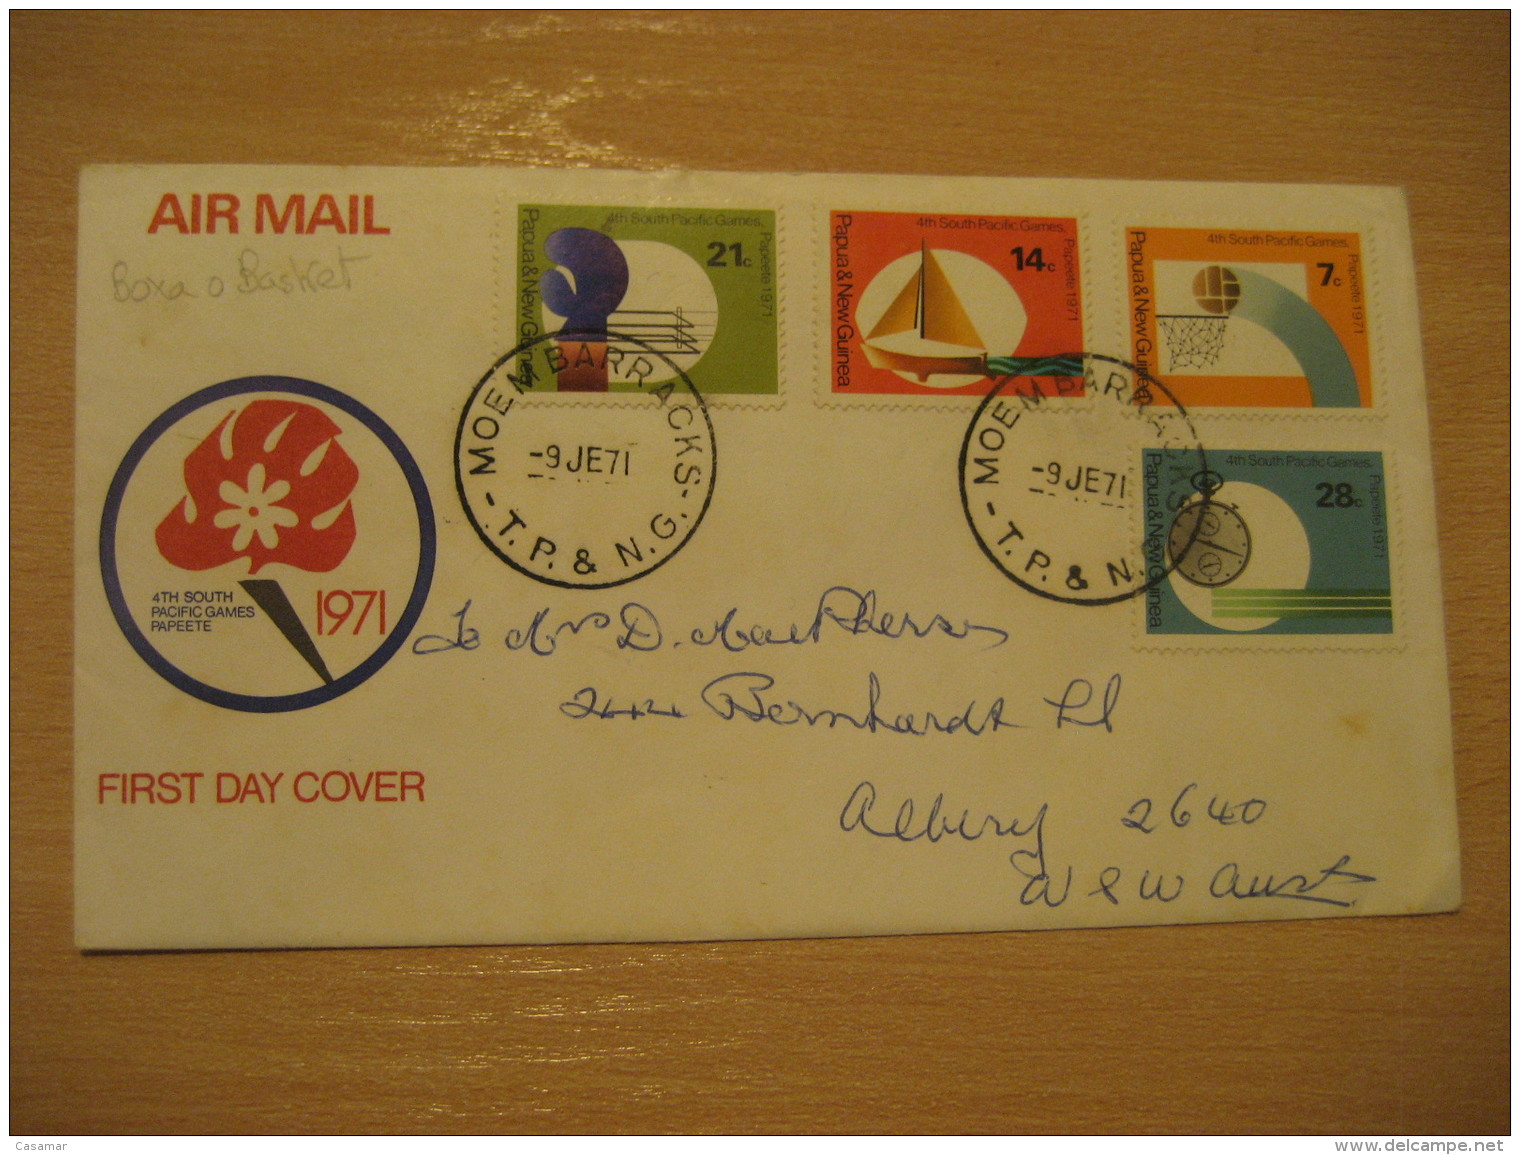 MOEM BARRACKS 1971 Papeete South Pacific Games Basketball Basket Baloncesto FDC Air Mail Cover PAPUA & NEW GUINEA - Basket-ball